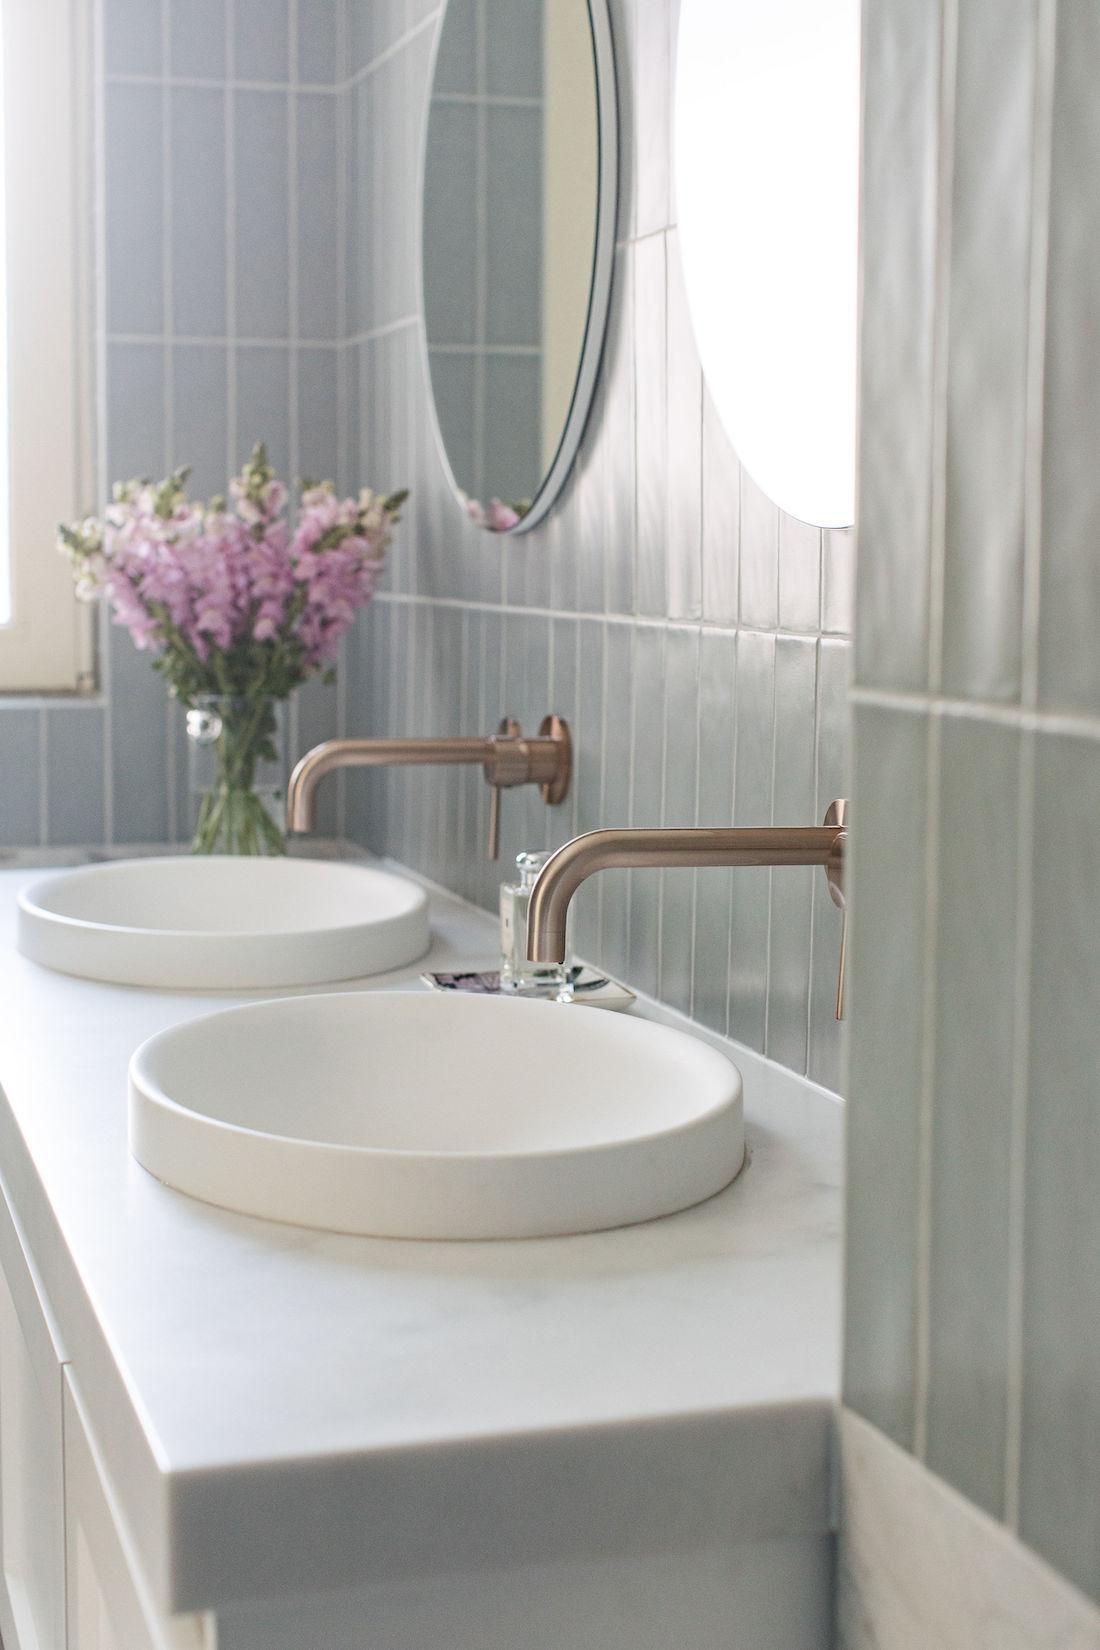 Double semi-inset basin in vanity